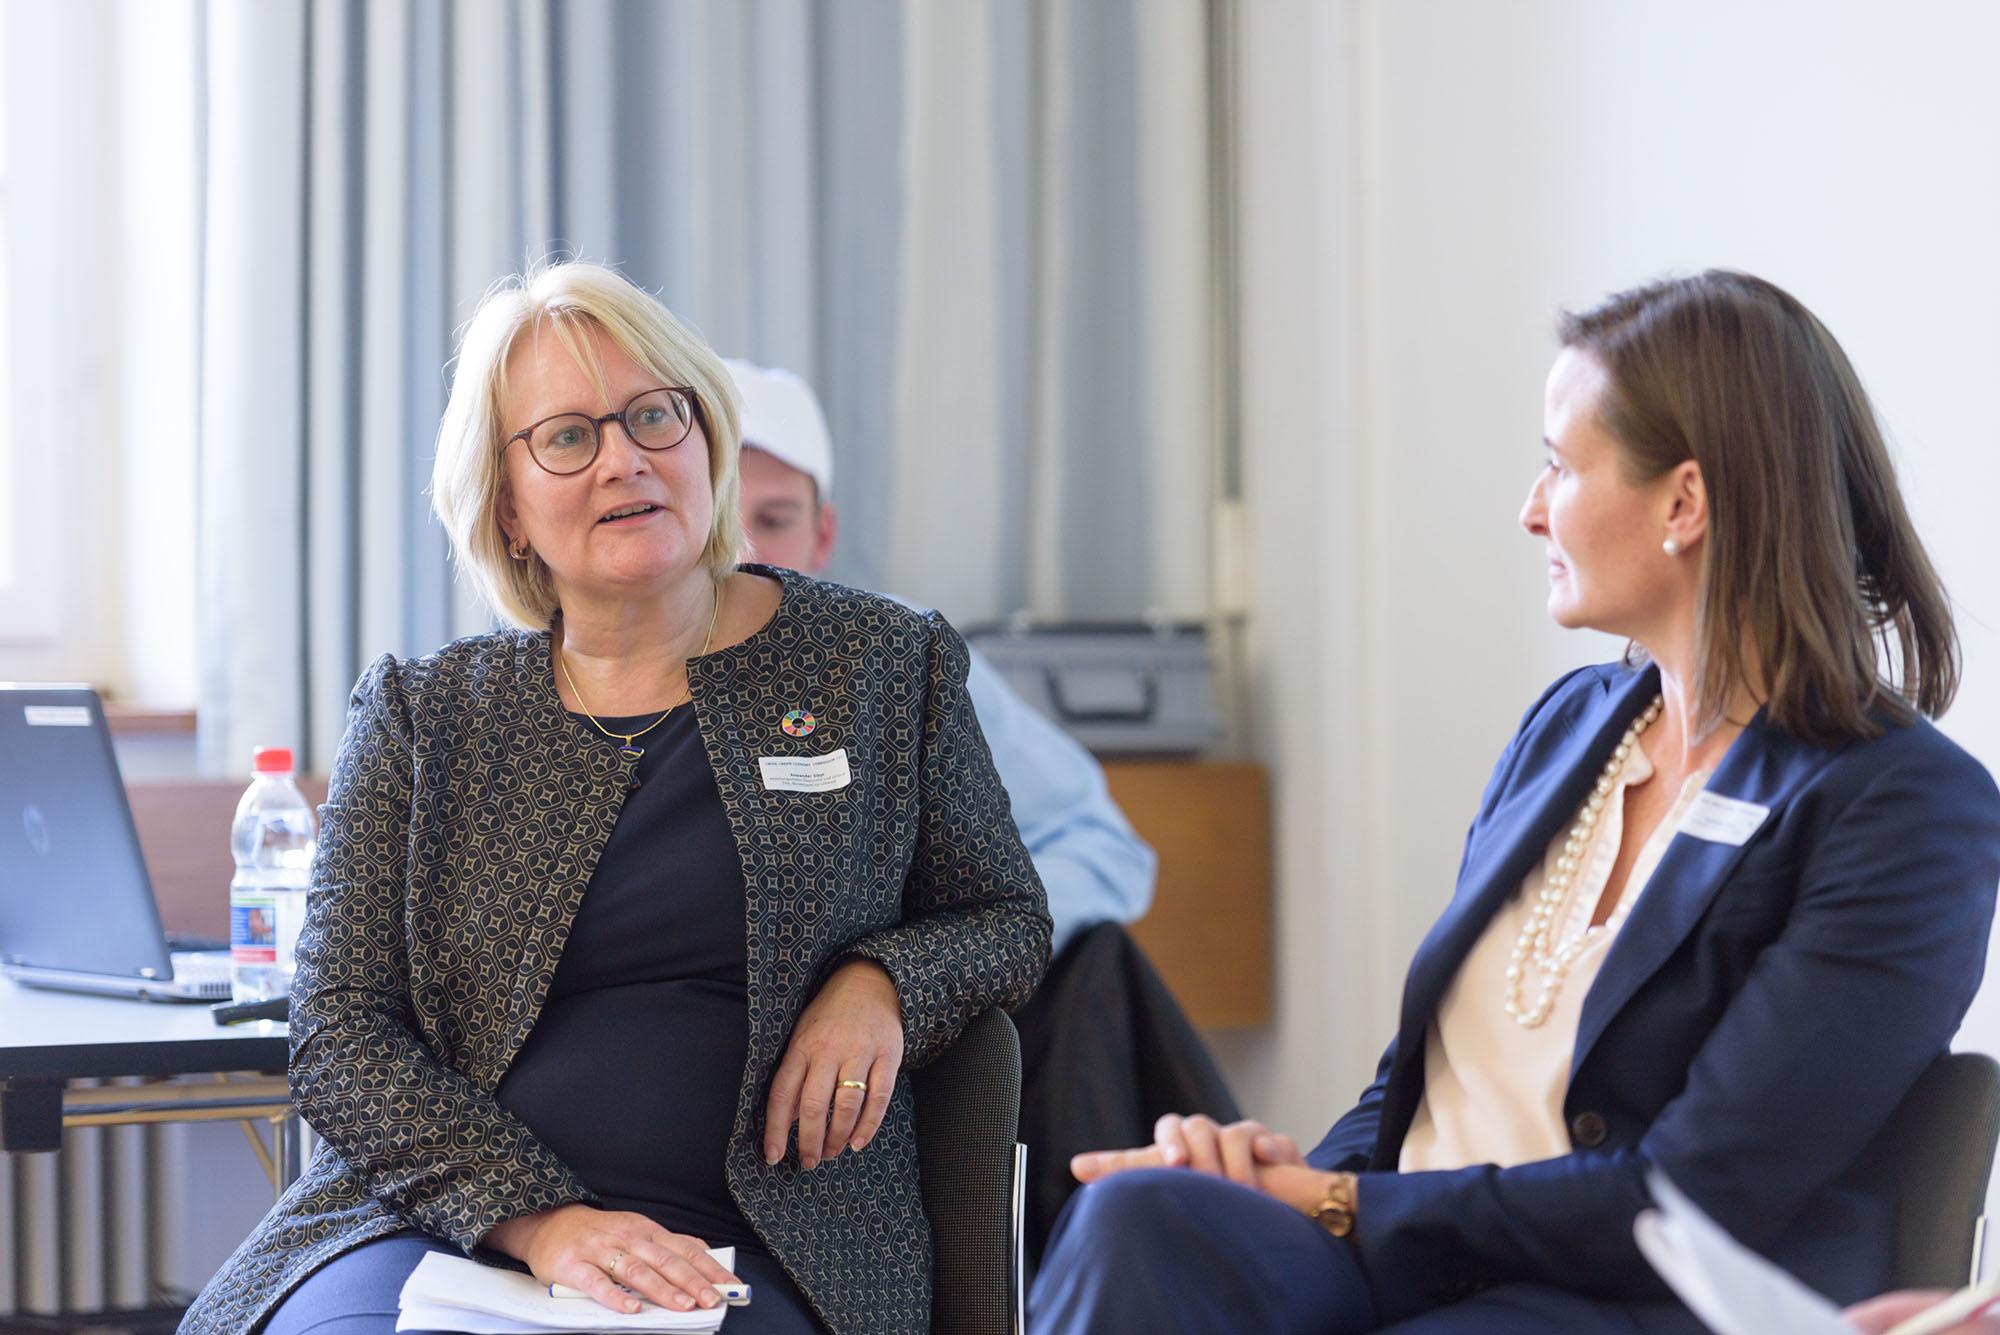 Sybil Anwander, Sabine Oberhuber